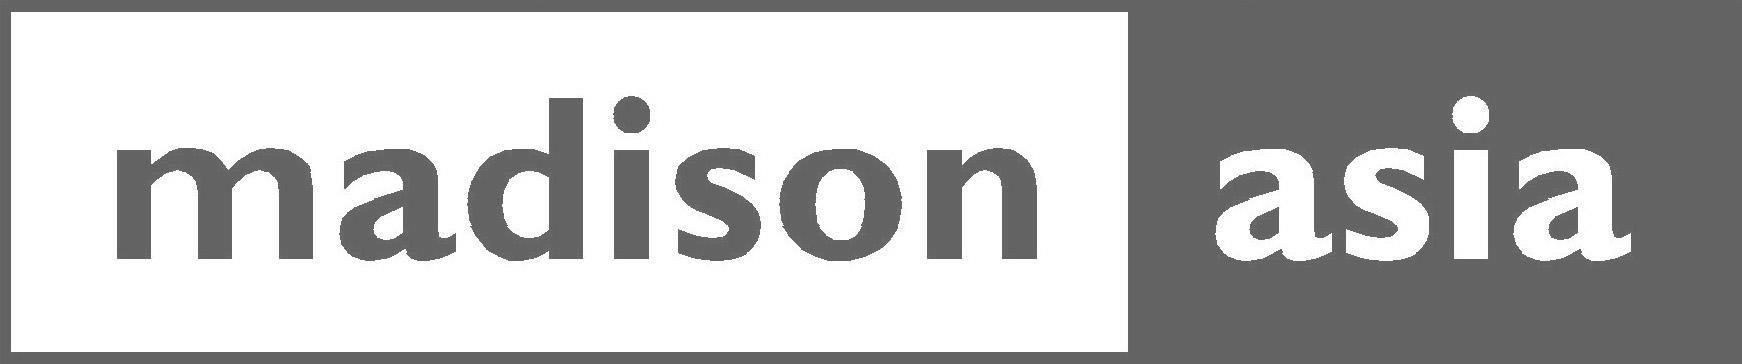 Madison Asia